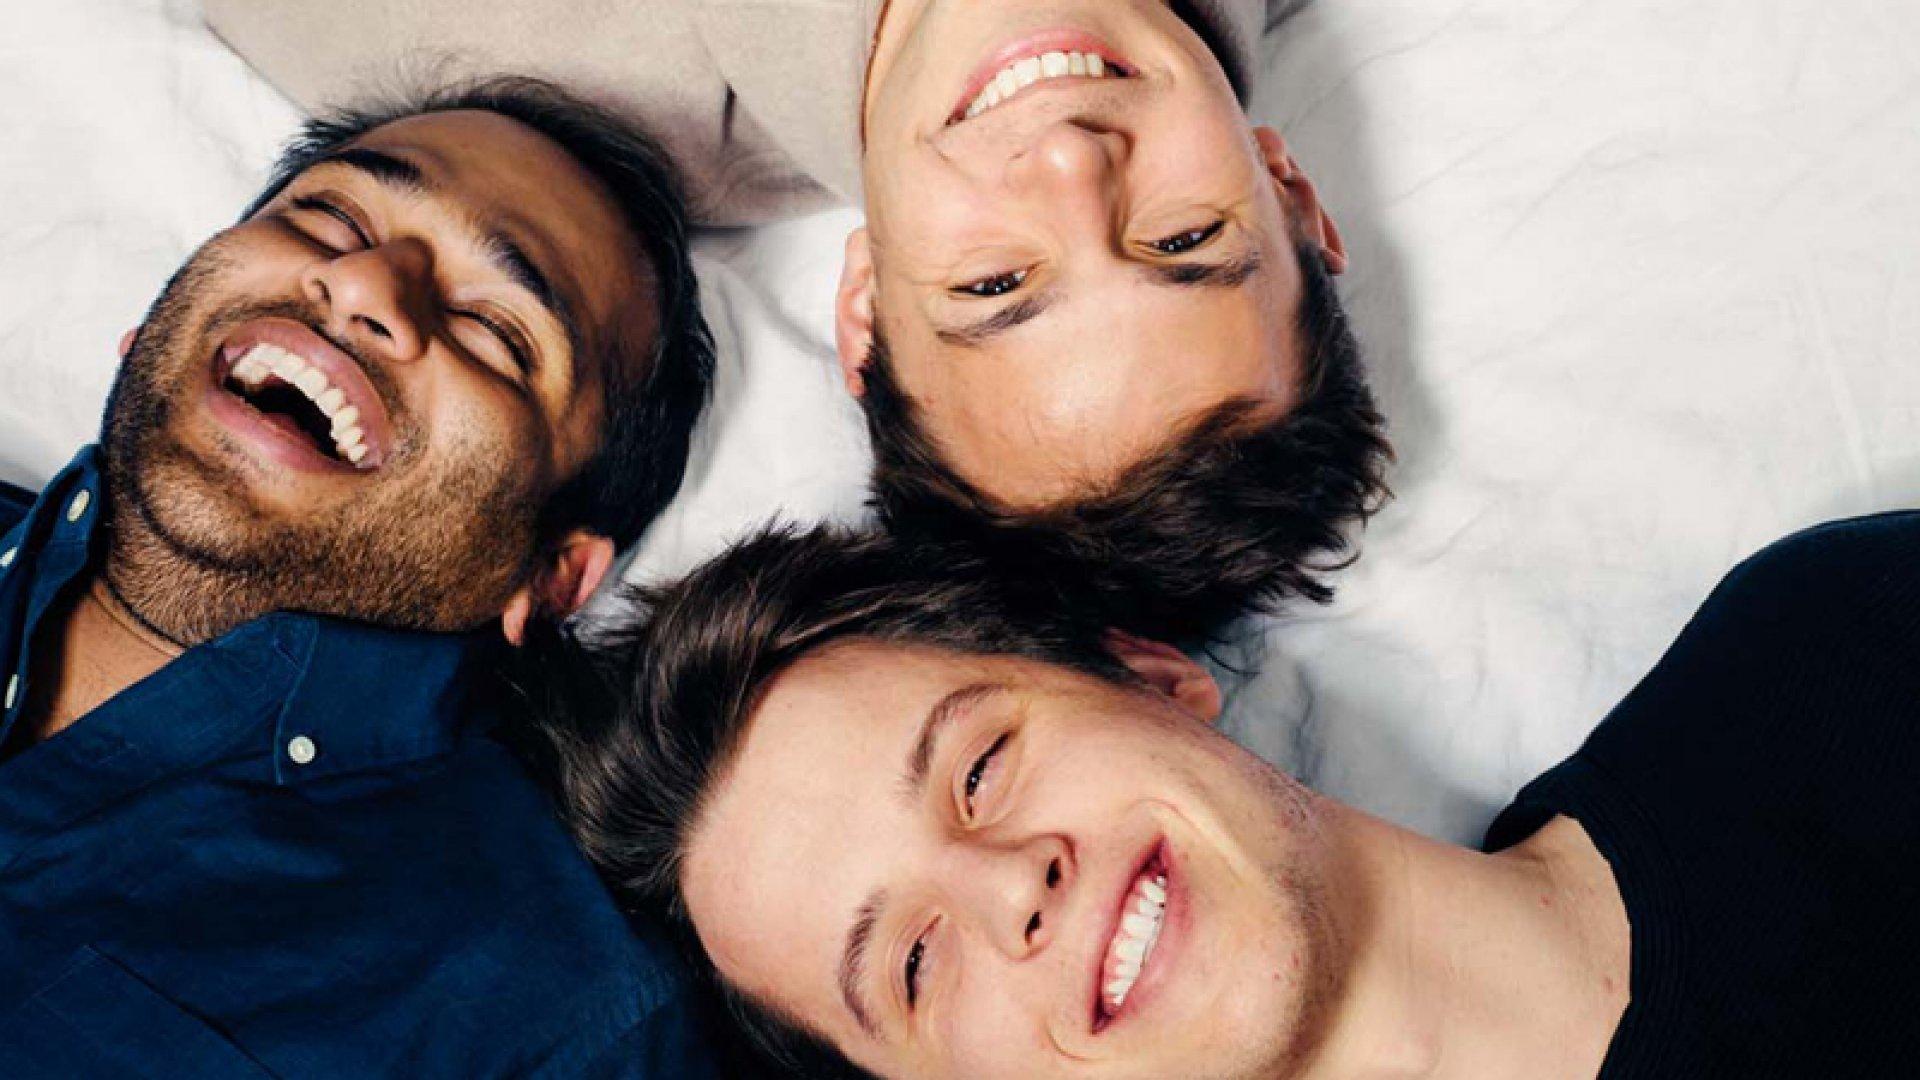 Casper co-founders Neil Parikh, 25 (bottom), Luke Sherwin, 26 (right), and Gabe Flateman, 24 (left), rest their heads on their favorite horizontal surface.